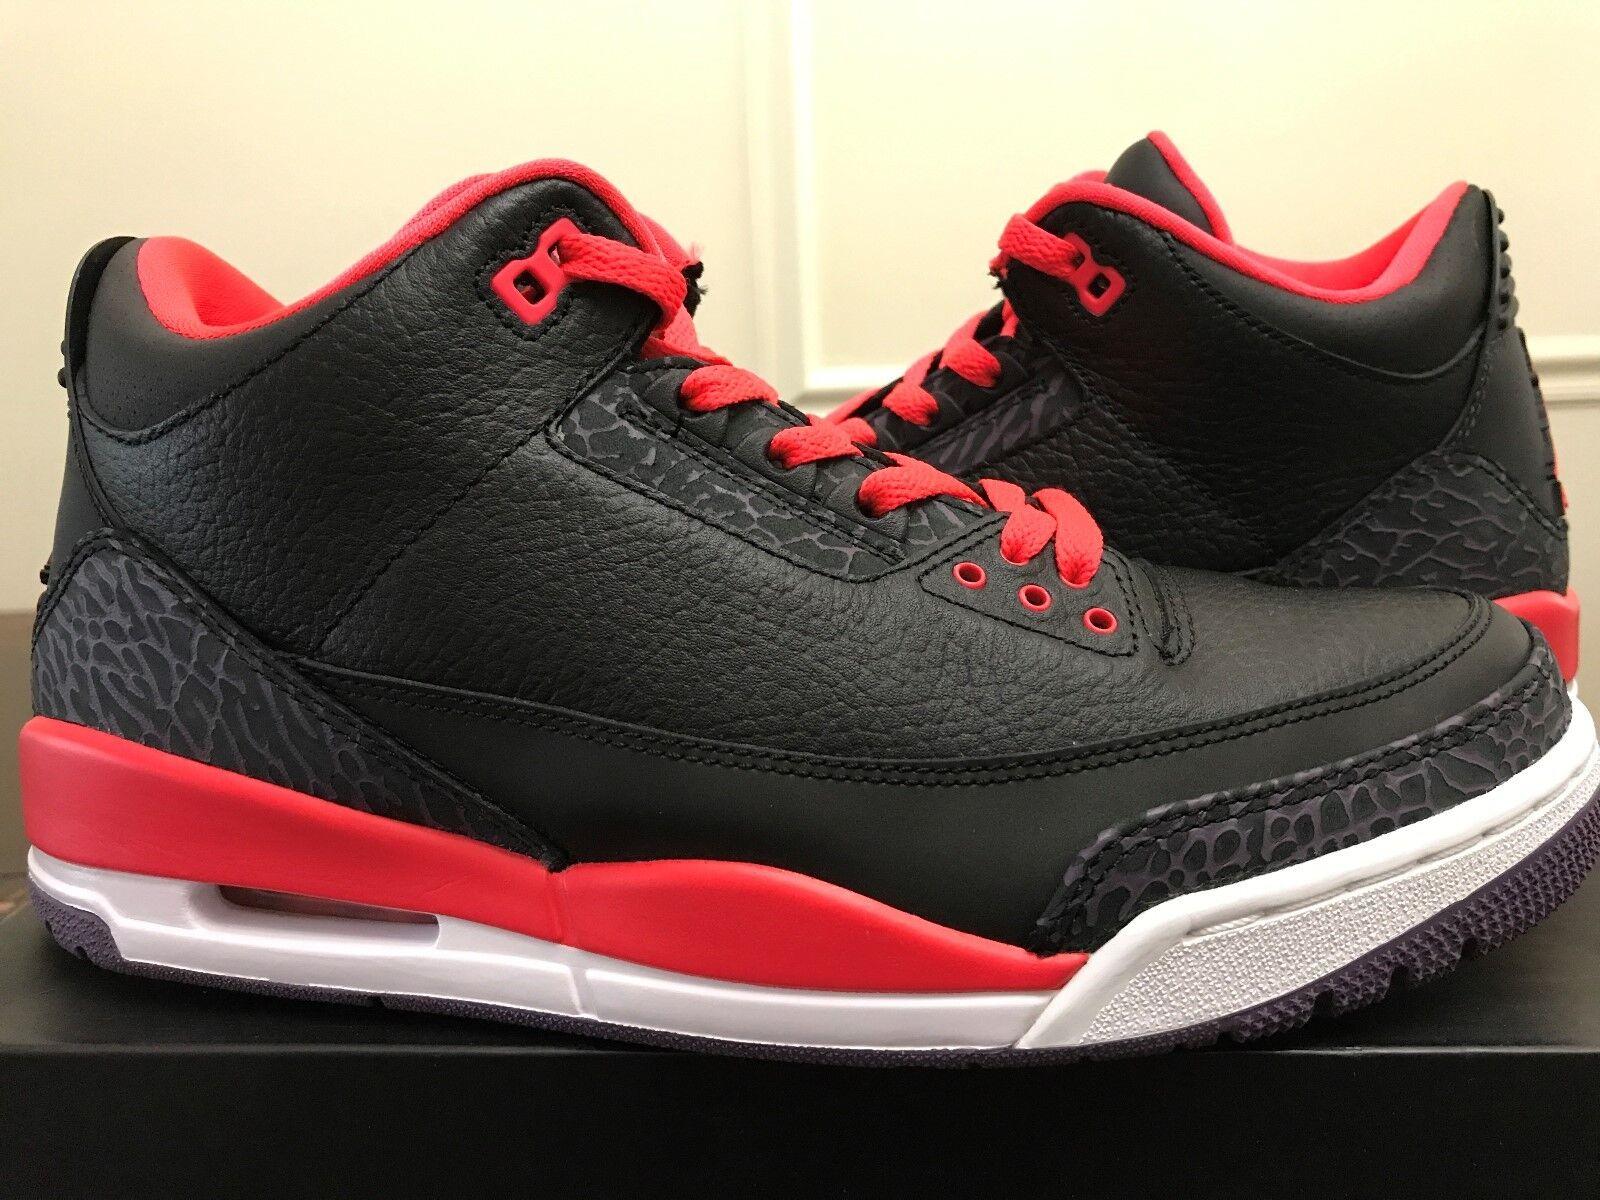 Nike Air Jordan Retro 3 III Size 9.5  Crimson  Black Red Purple White 2012 23